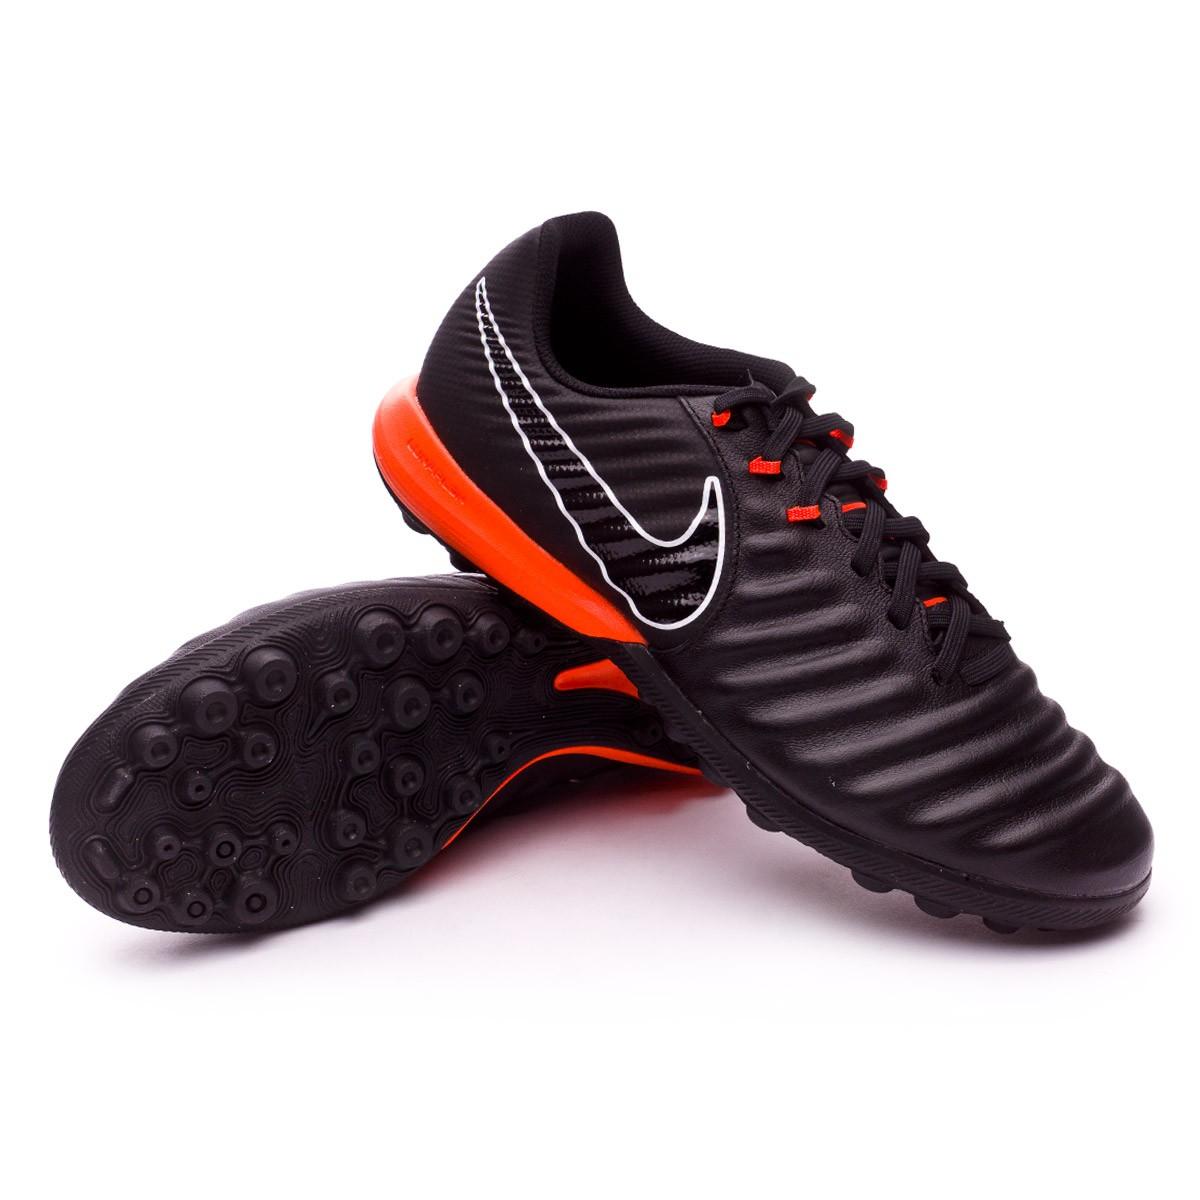 f0529d5d911 Tenis Nike Tiempo Lunar LegendX VII Pro Turf Black-Total orange - Tienda de  fútbol Fútbol Emotion